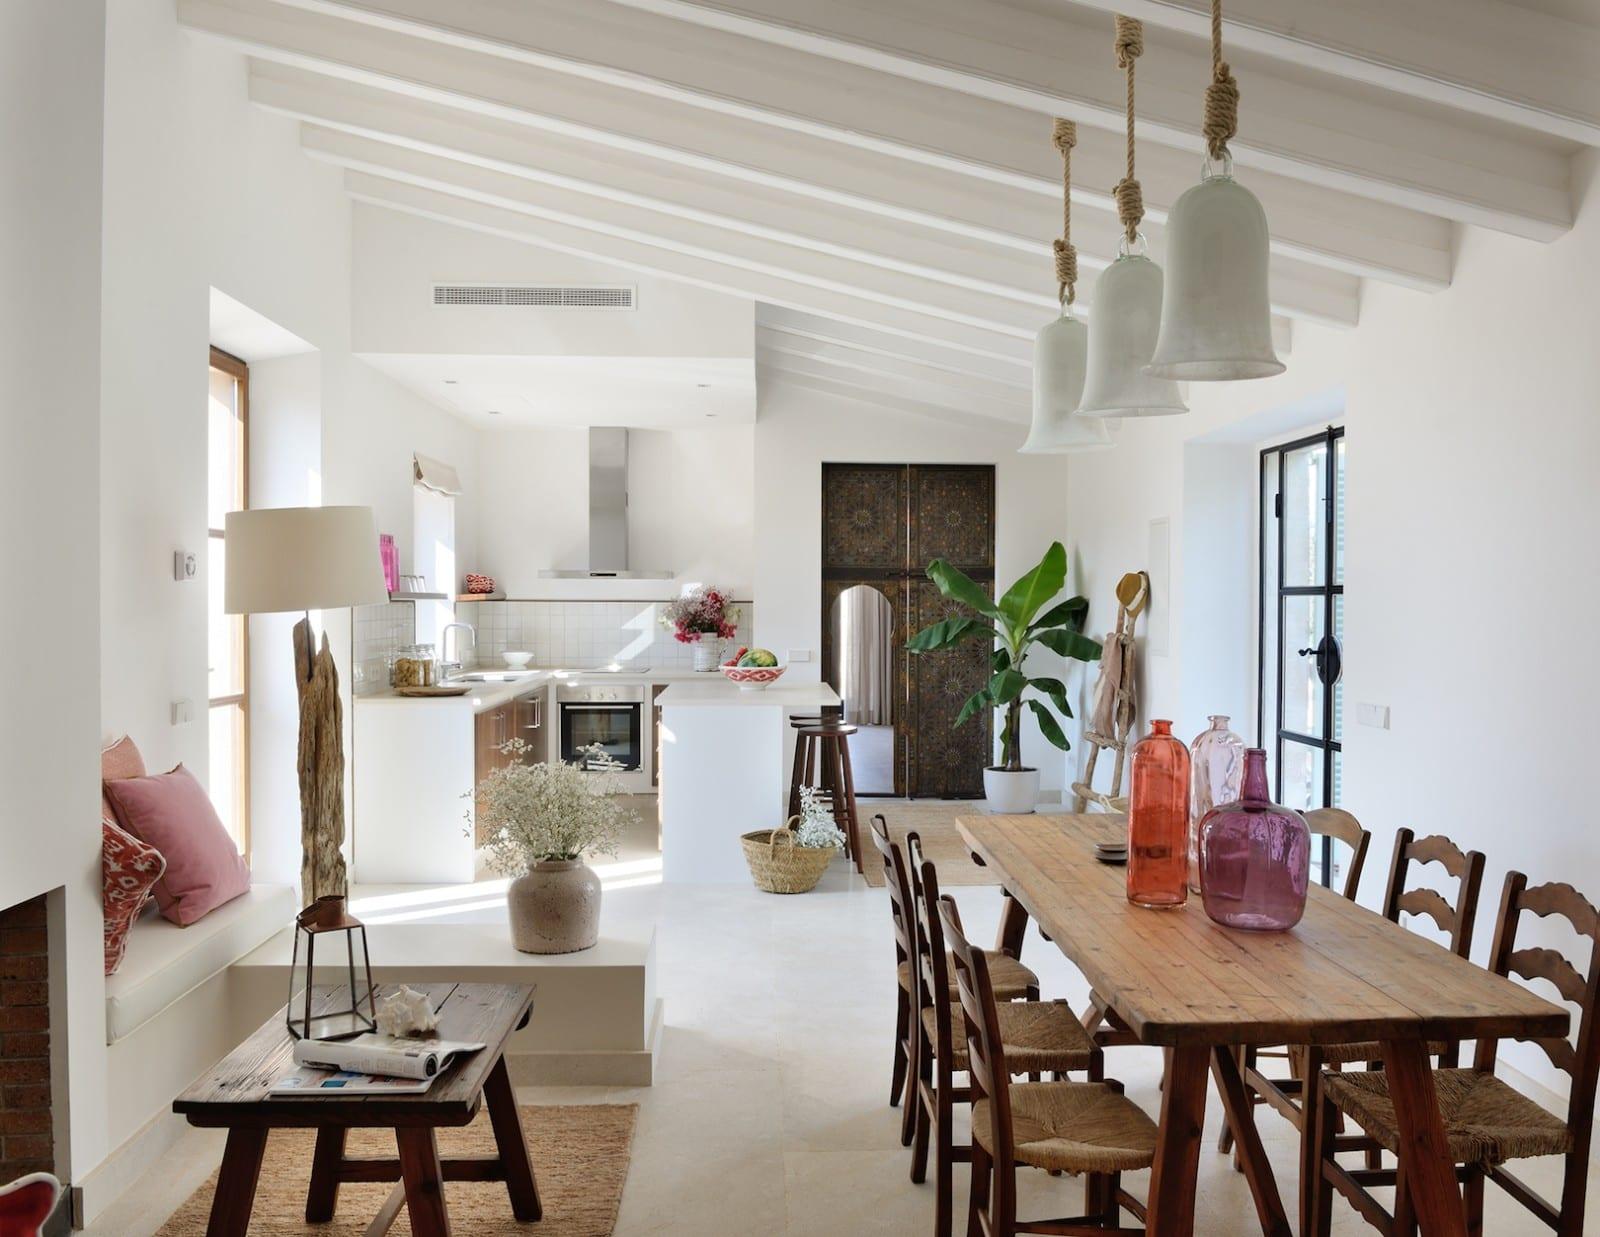 Holistic Retreat Cal Reiet Casita Terra living room and kitchen